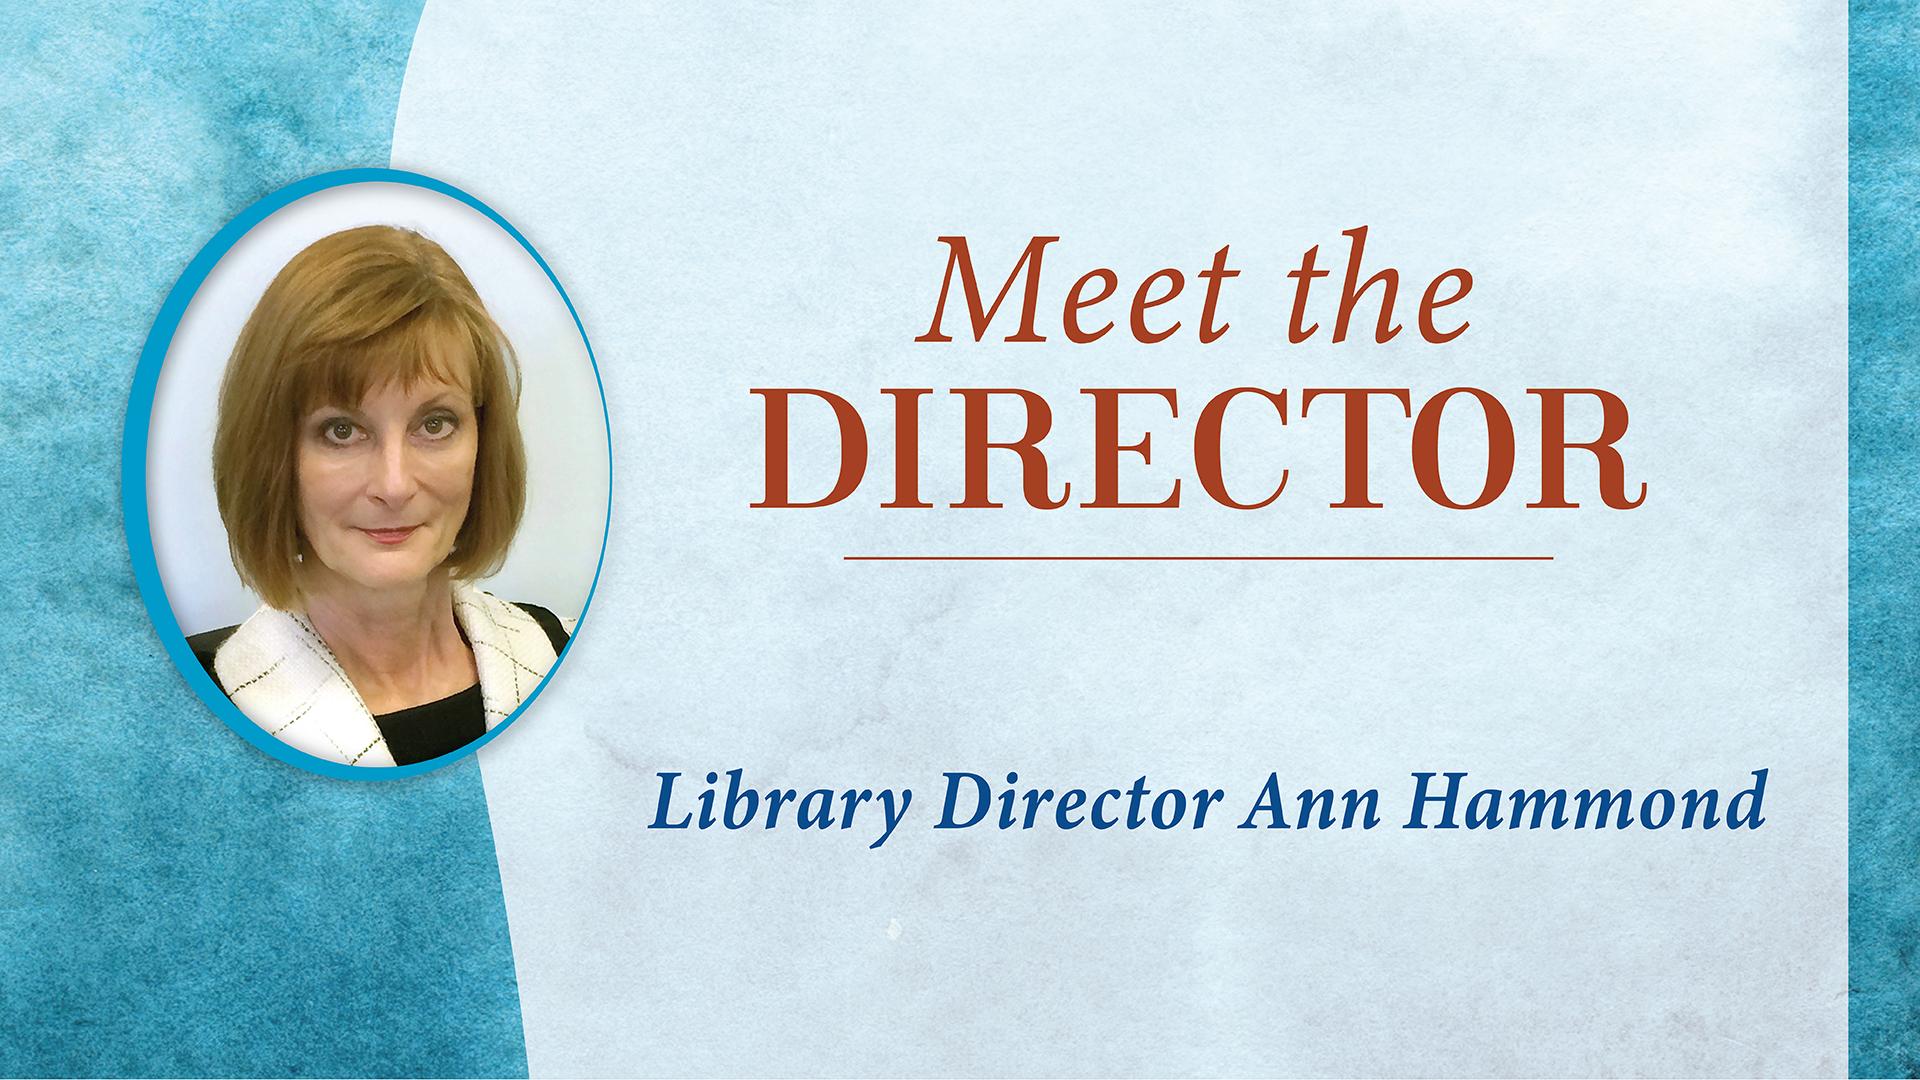 Meet the Director